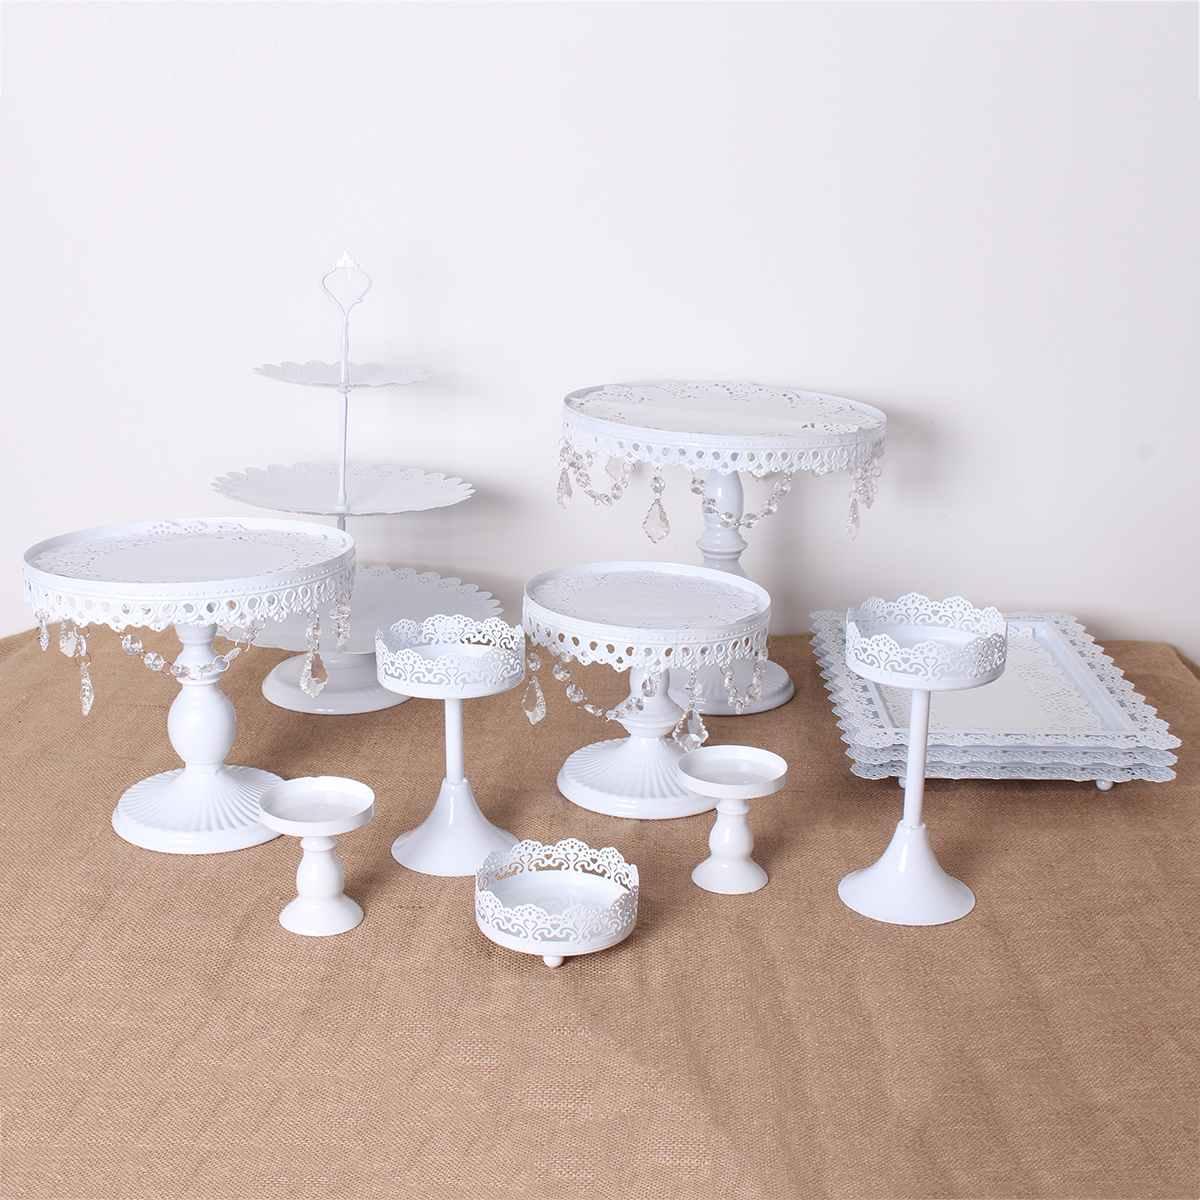 US 5Pcs Wedding Cake Stand Crystal Metal Cupcake Holder Crystal Plates Set Decor